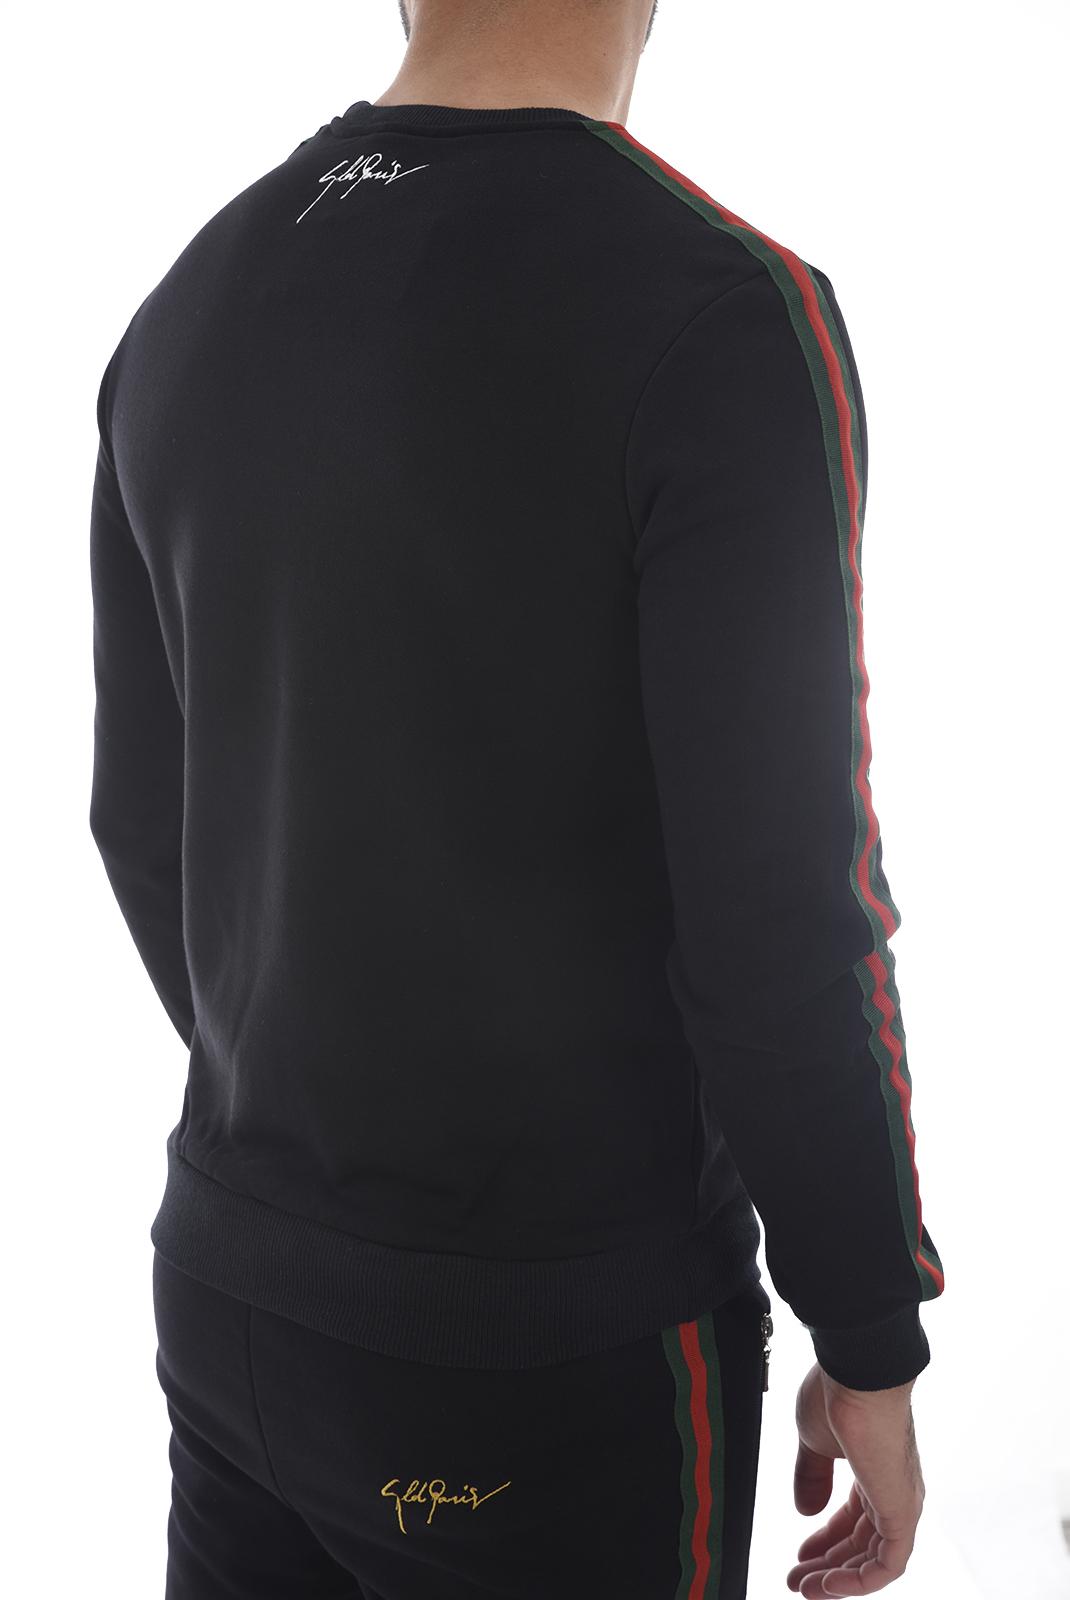 Sweatshirts  Goldenim paris 1004 NOIR